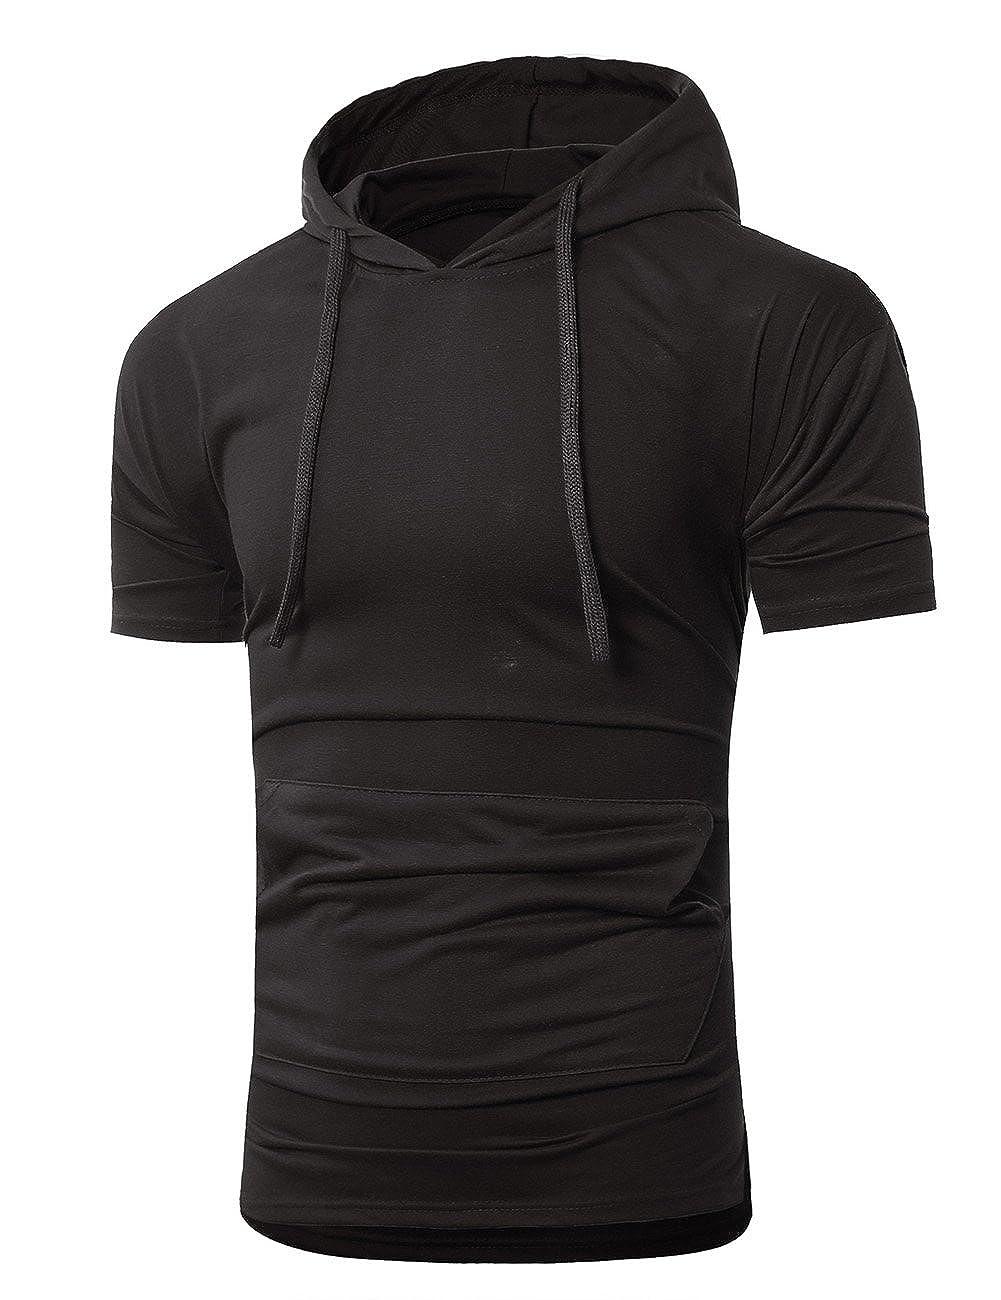 DSstyles T-Shirts Men Hoodie T Shirt Short Sleeve Slim T Shirt Pure Color Hooded Tops